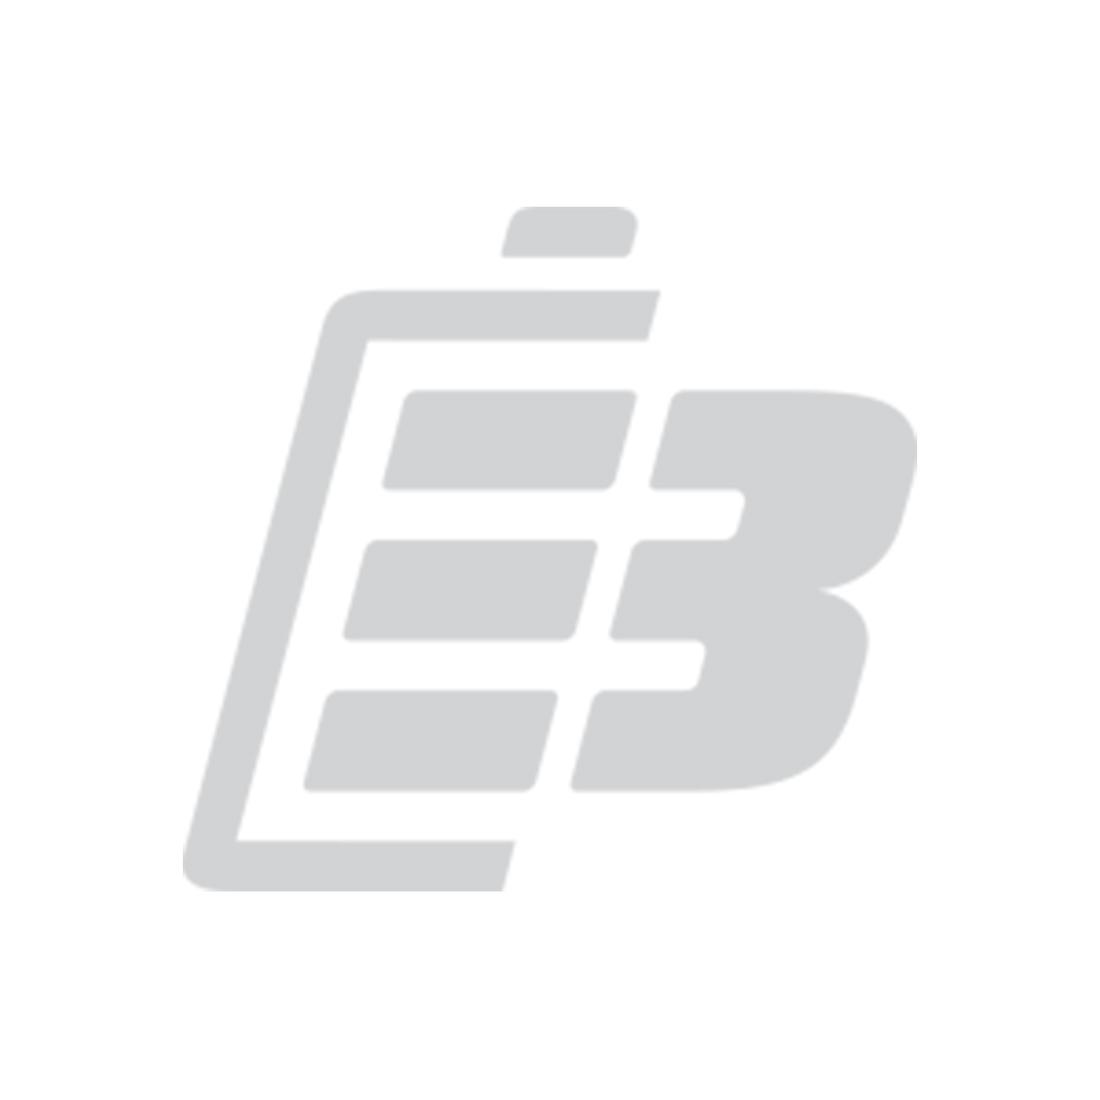 Power tool battery Makita 14.4V 4.0Ah_1